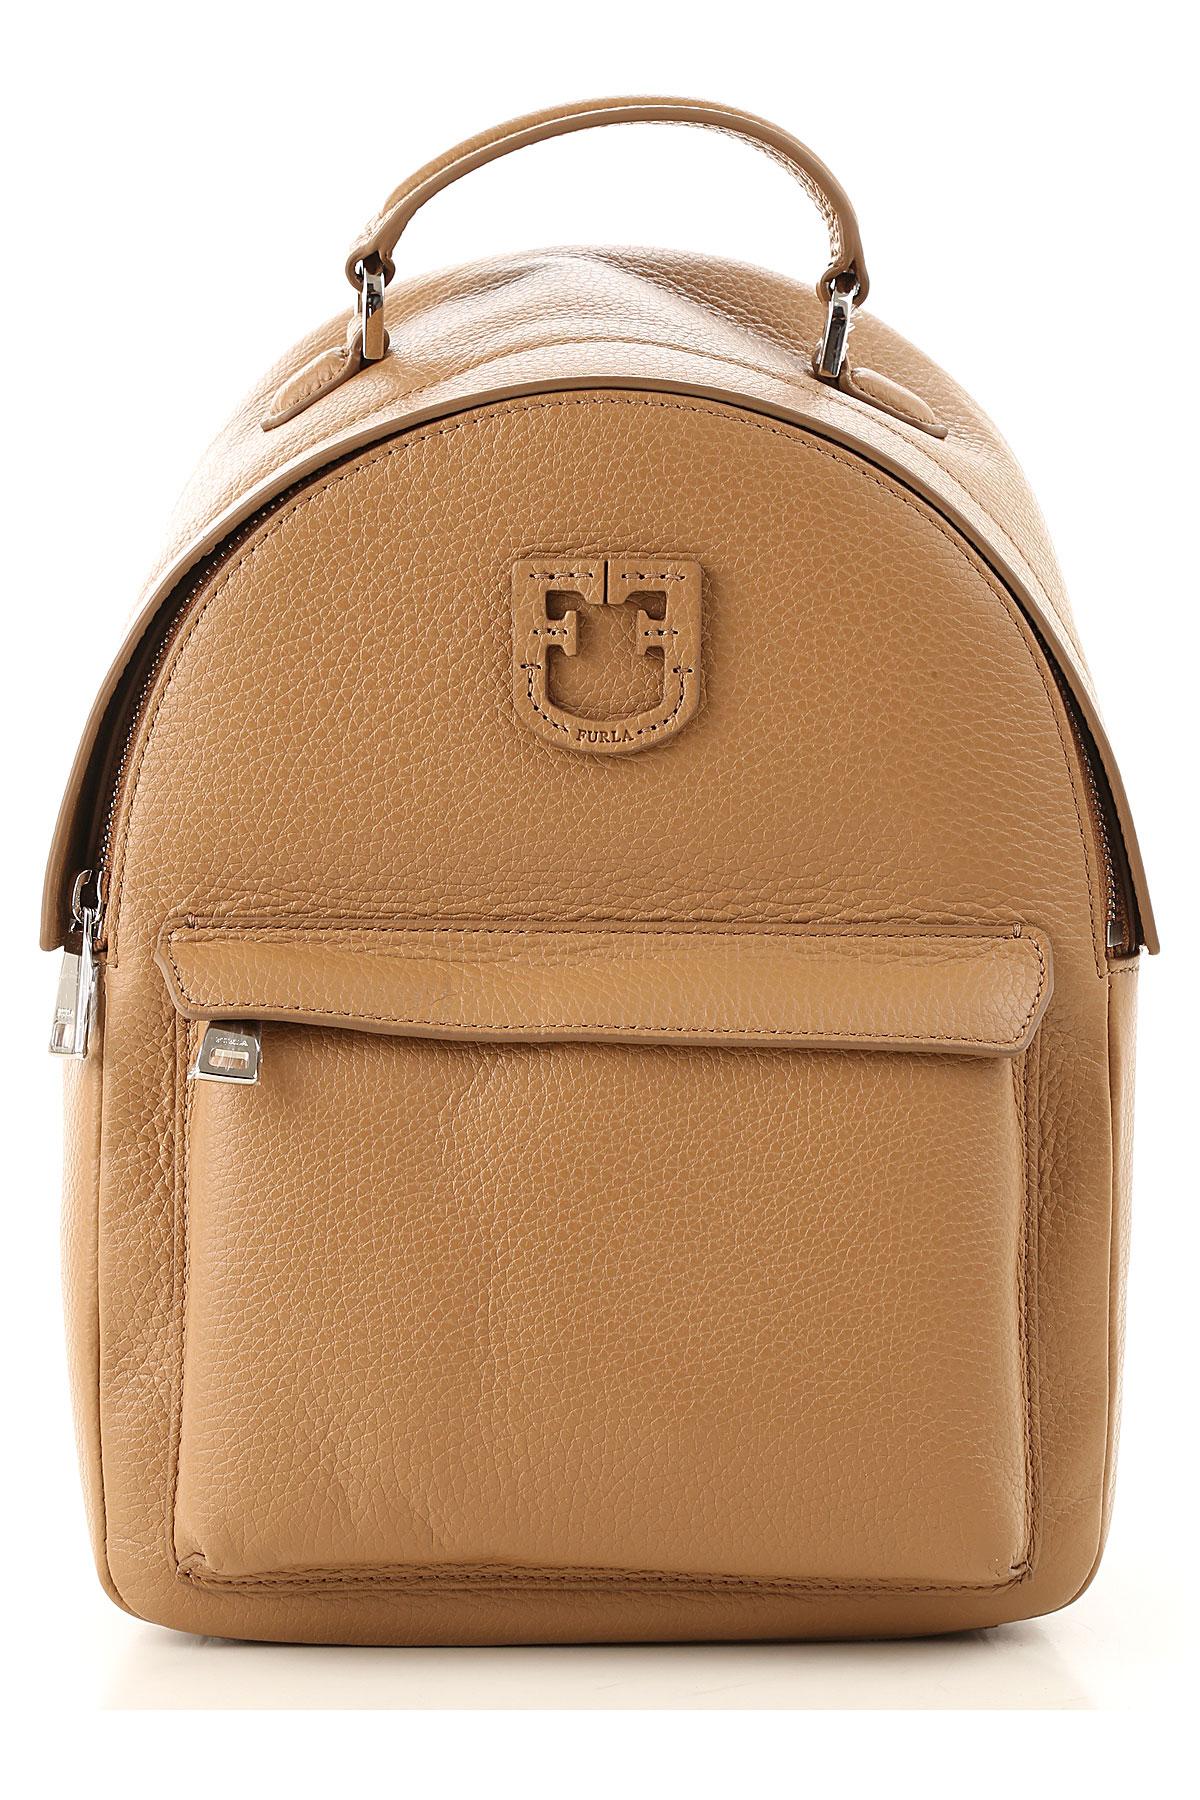 Furla Backpack for Women On Sale, Beige, Leather, 2019